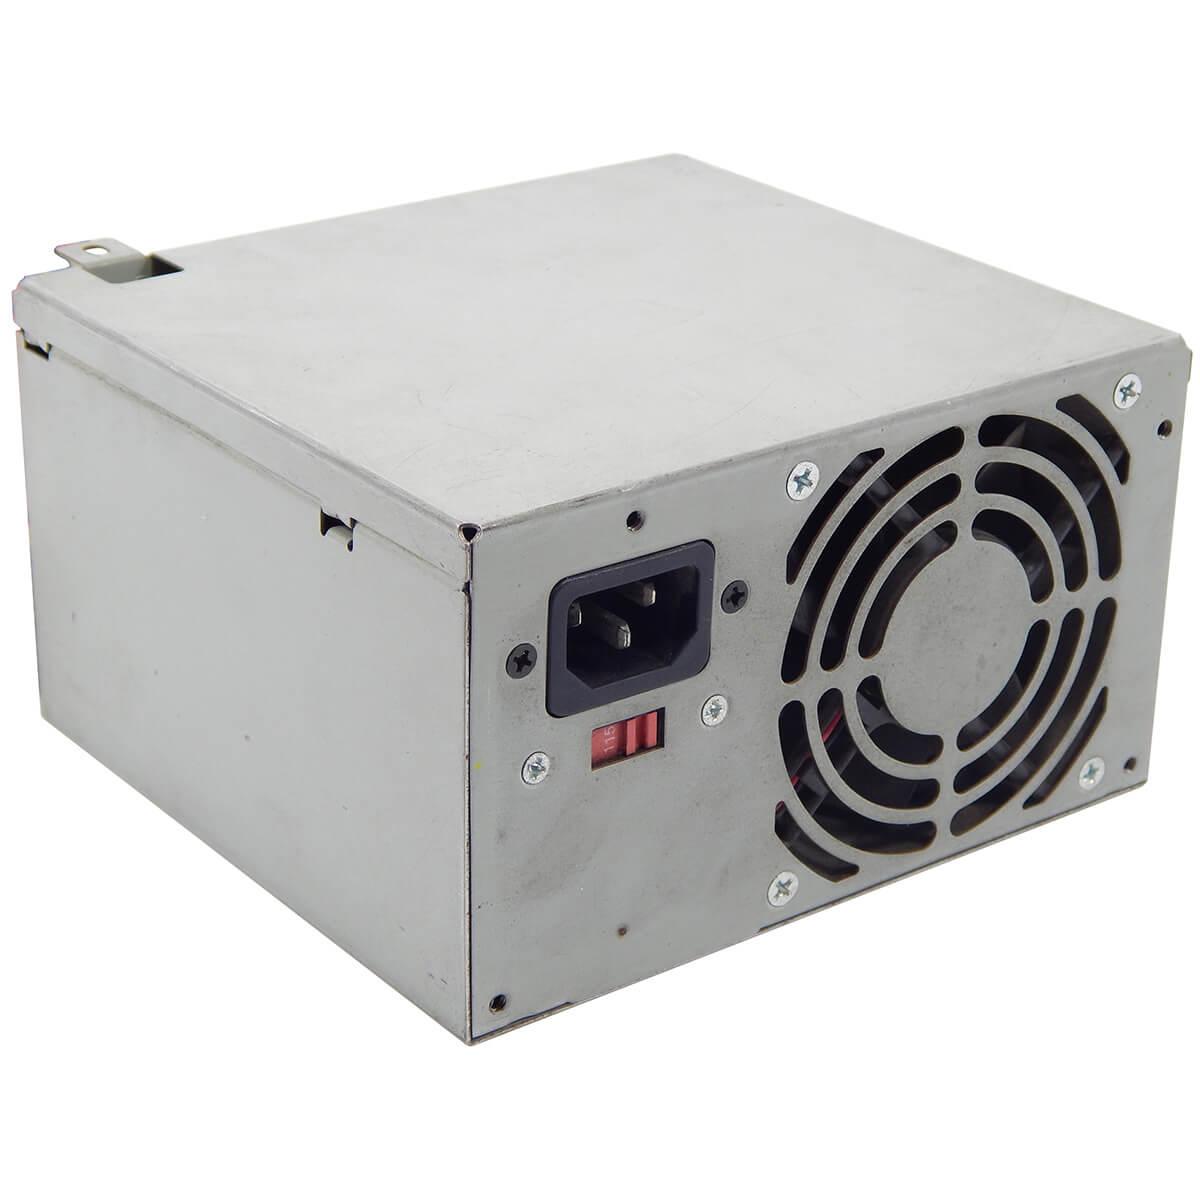 Fonte Compaq HP-Q250GF3 250w 20 Pinos  - Usada